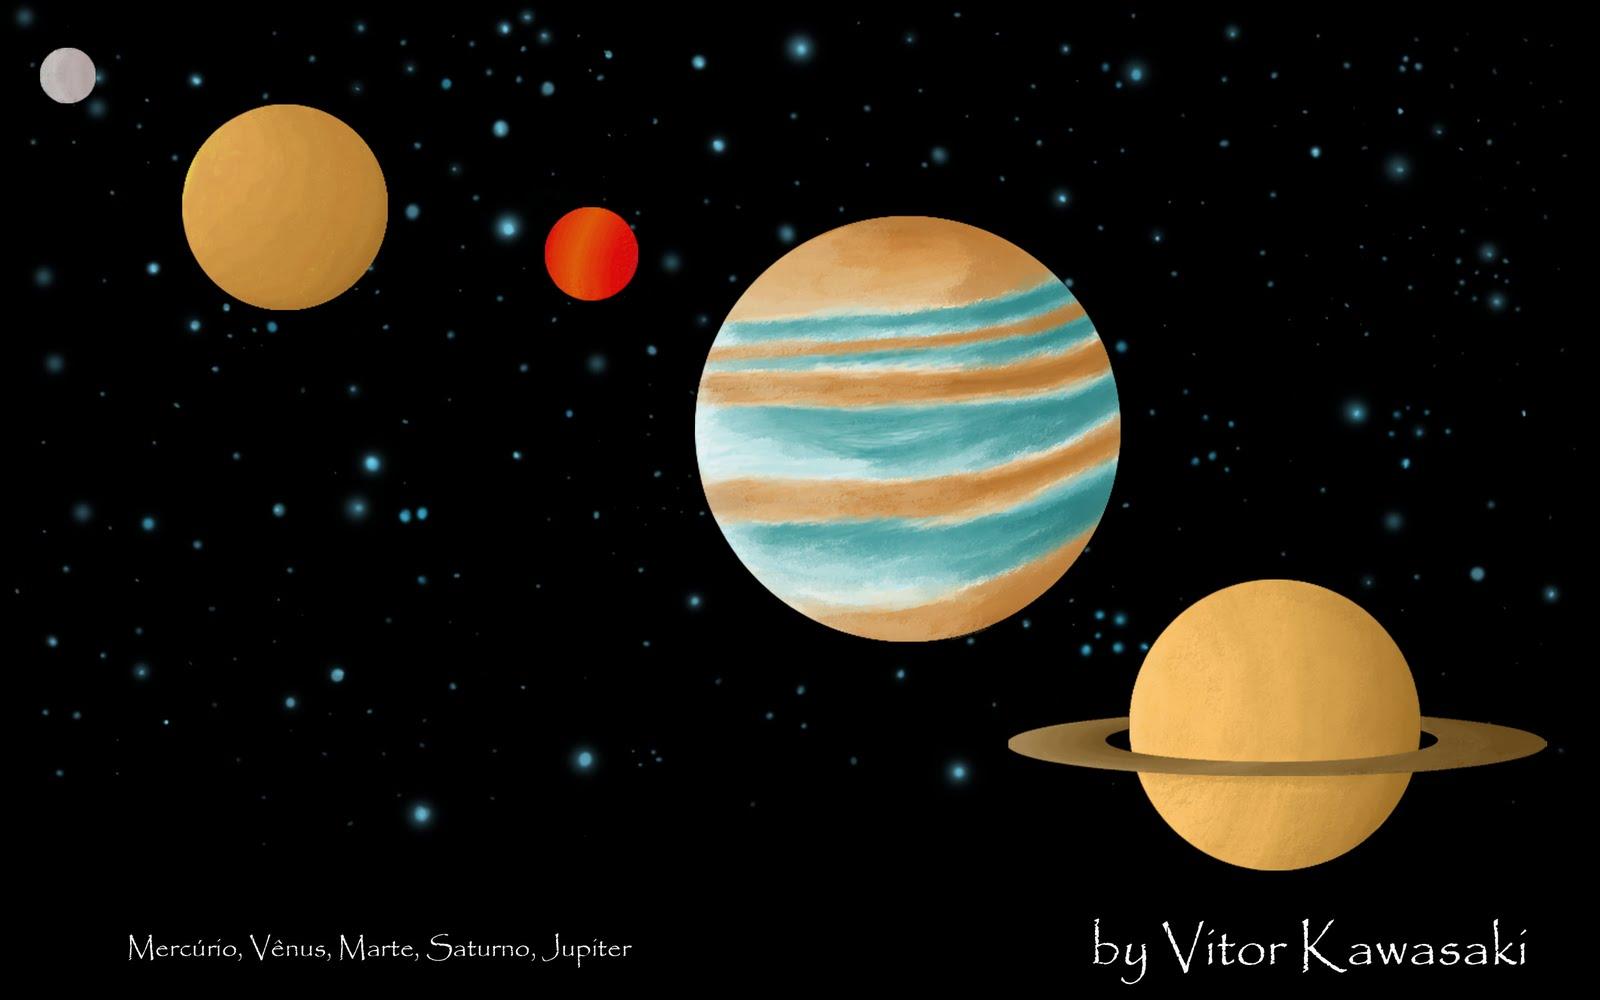 Planetas Do Sistema Solar Em Maquete Tattoo Designs Picture Pictures